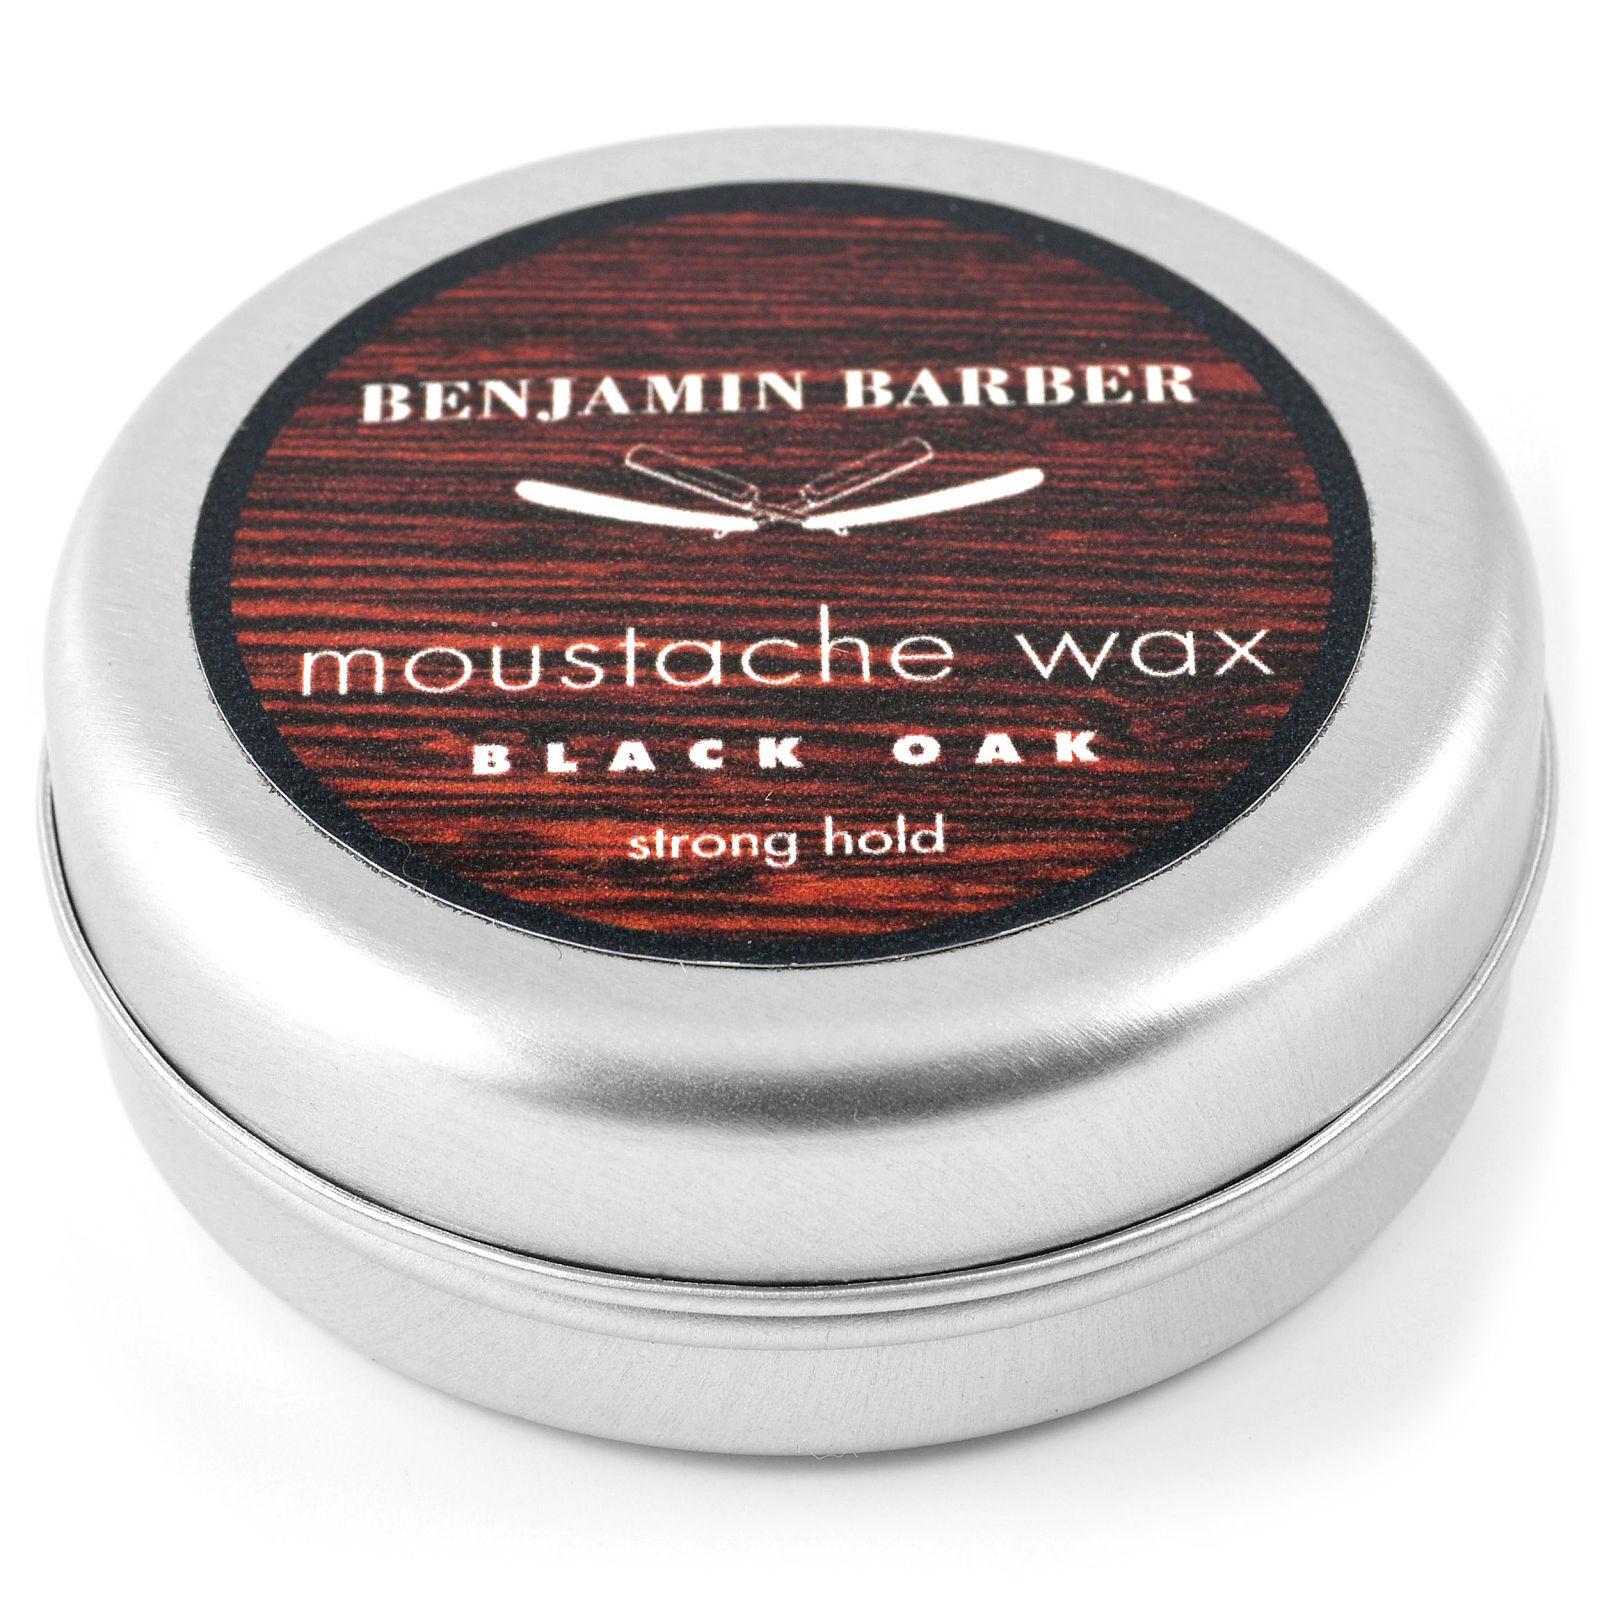 Benjamin Barber Black Oak Viiksivaha